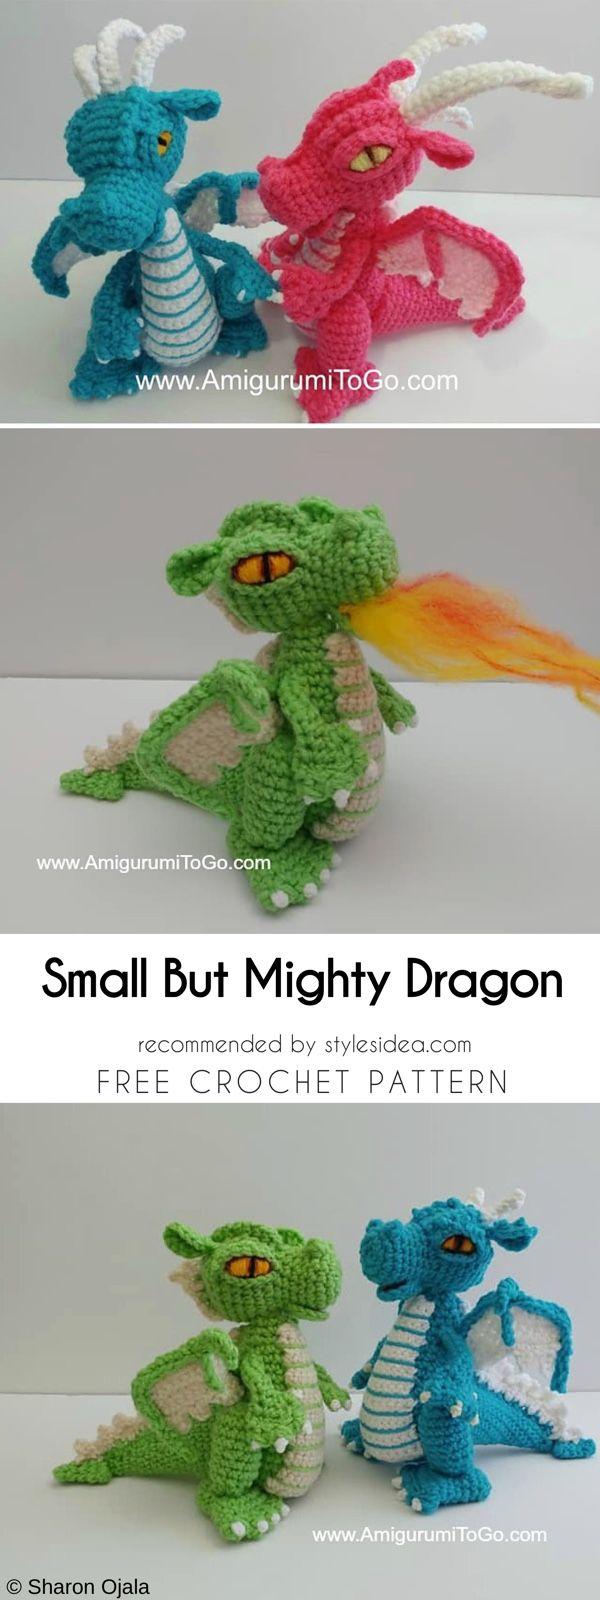 Amigurumi world collection free crochet patterns amigurumi